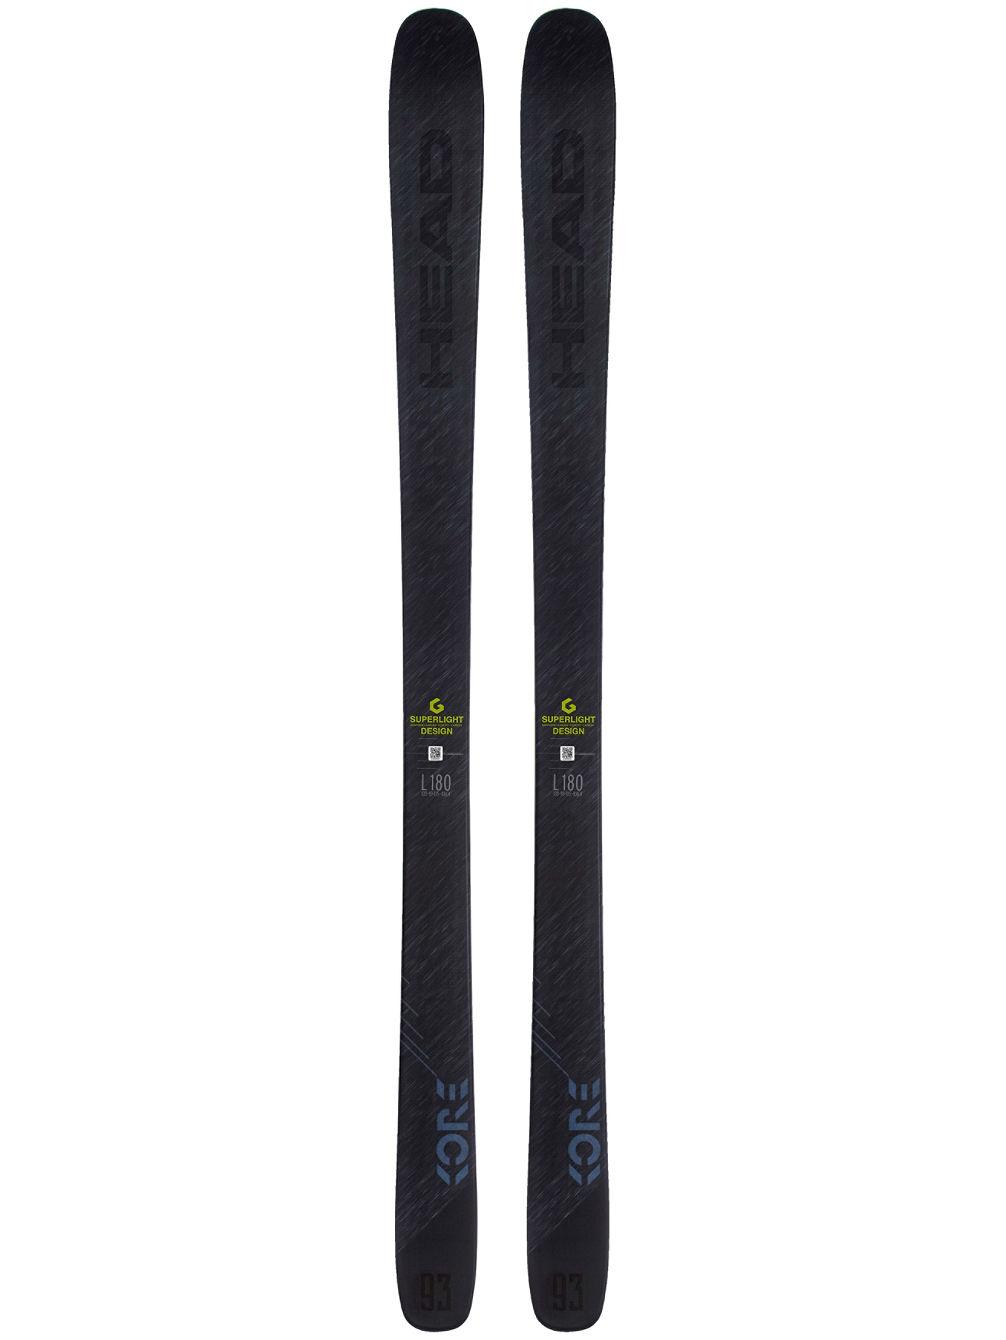 Kore 93 171 2019 Ski